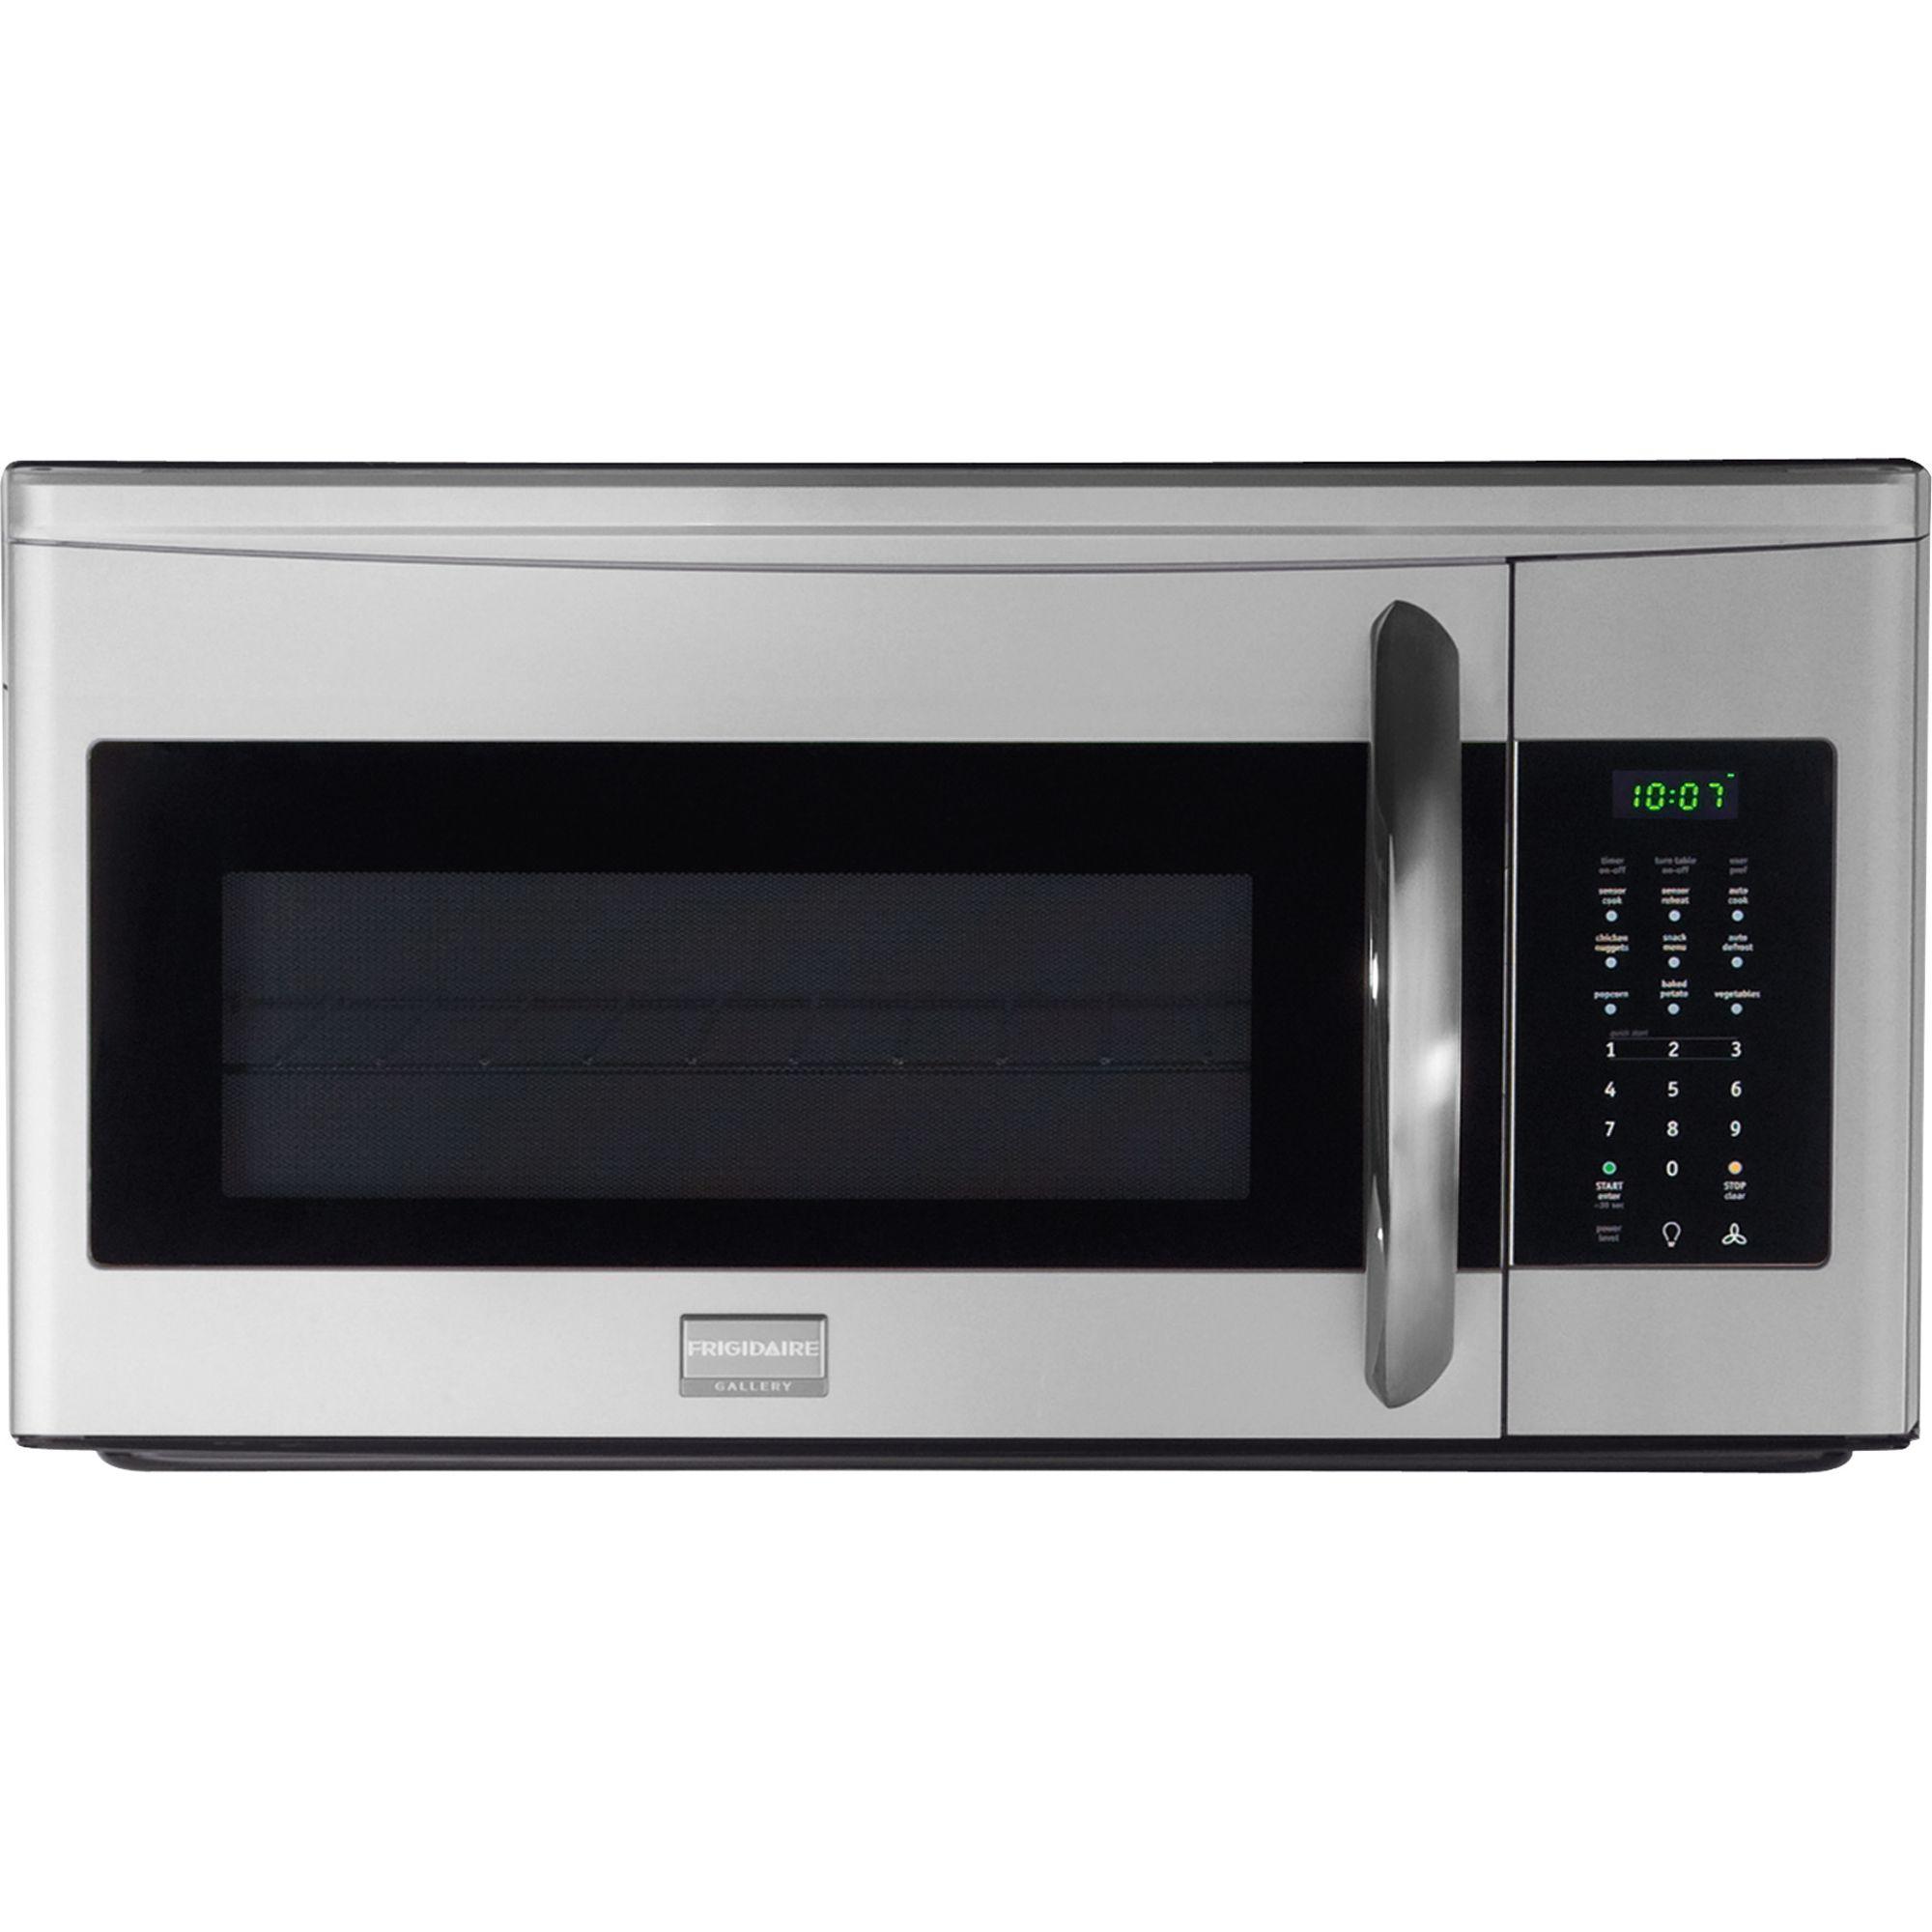 kitchen ventilation options best appliances frigidaire gallery fgmv174kf 30